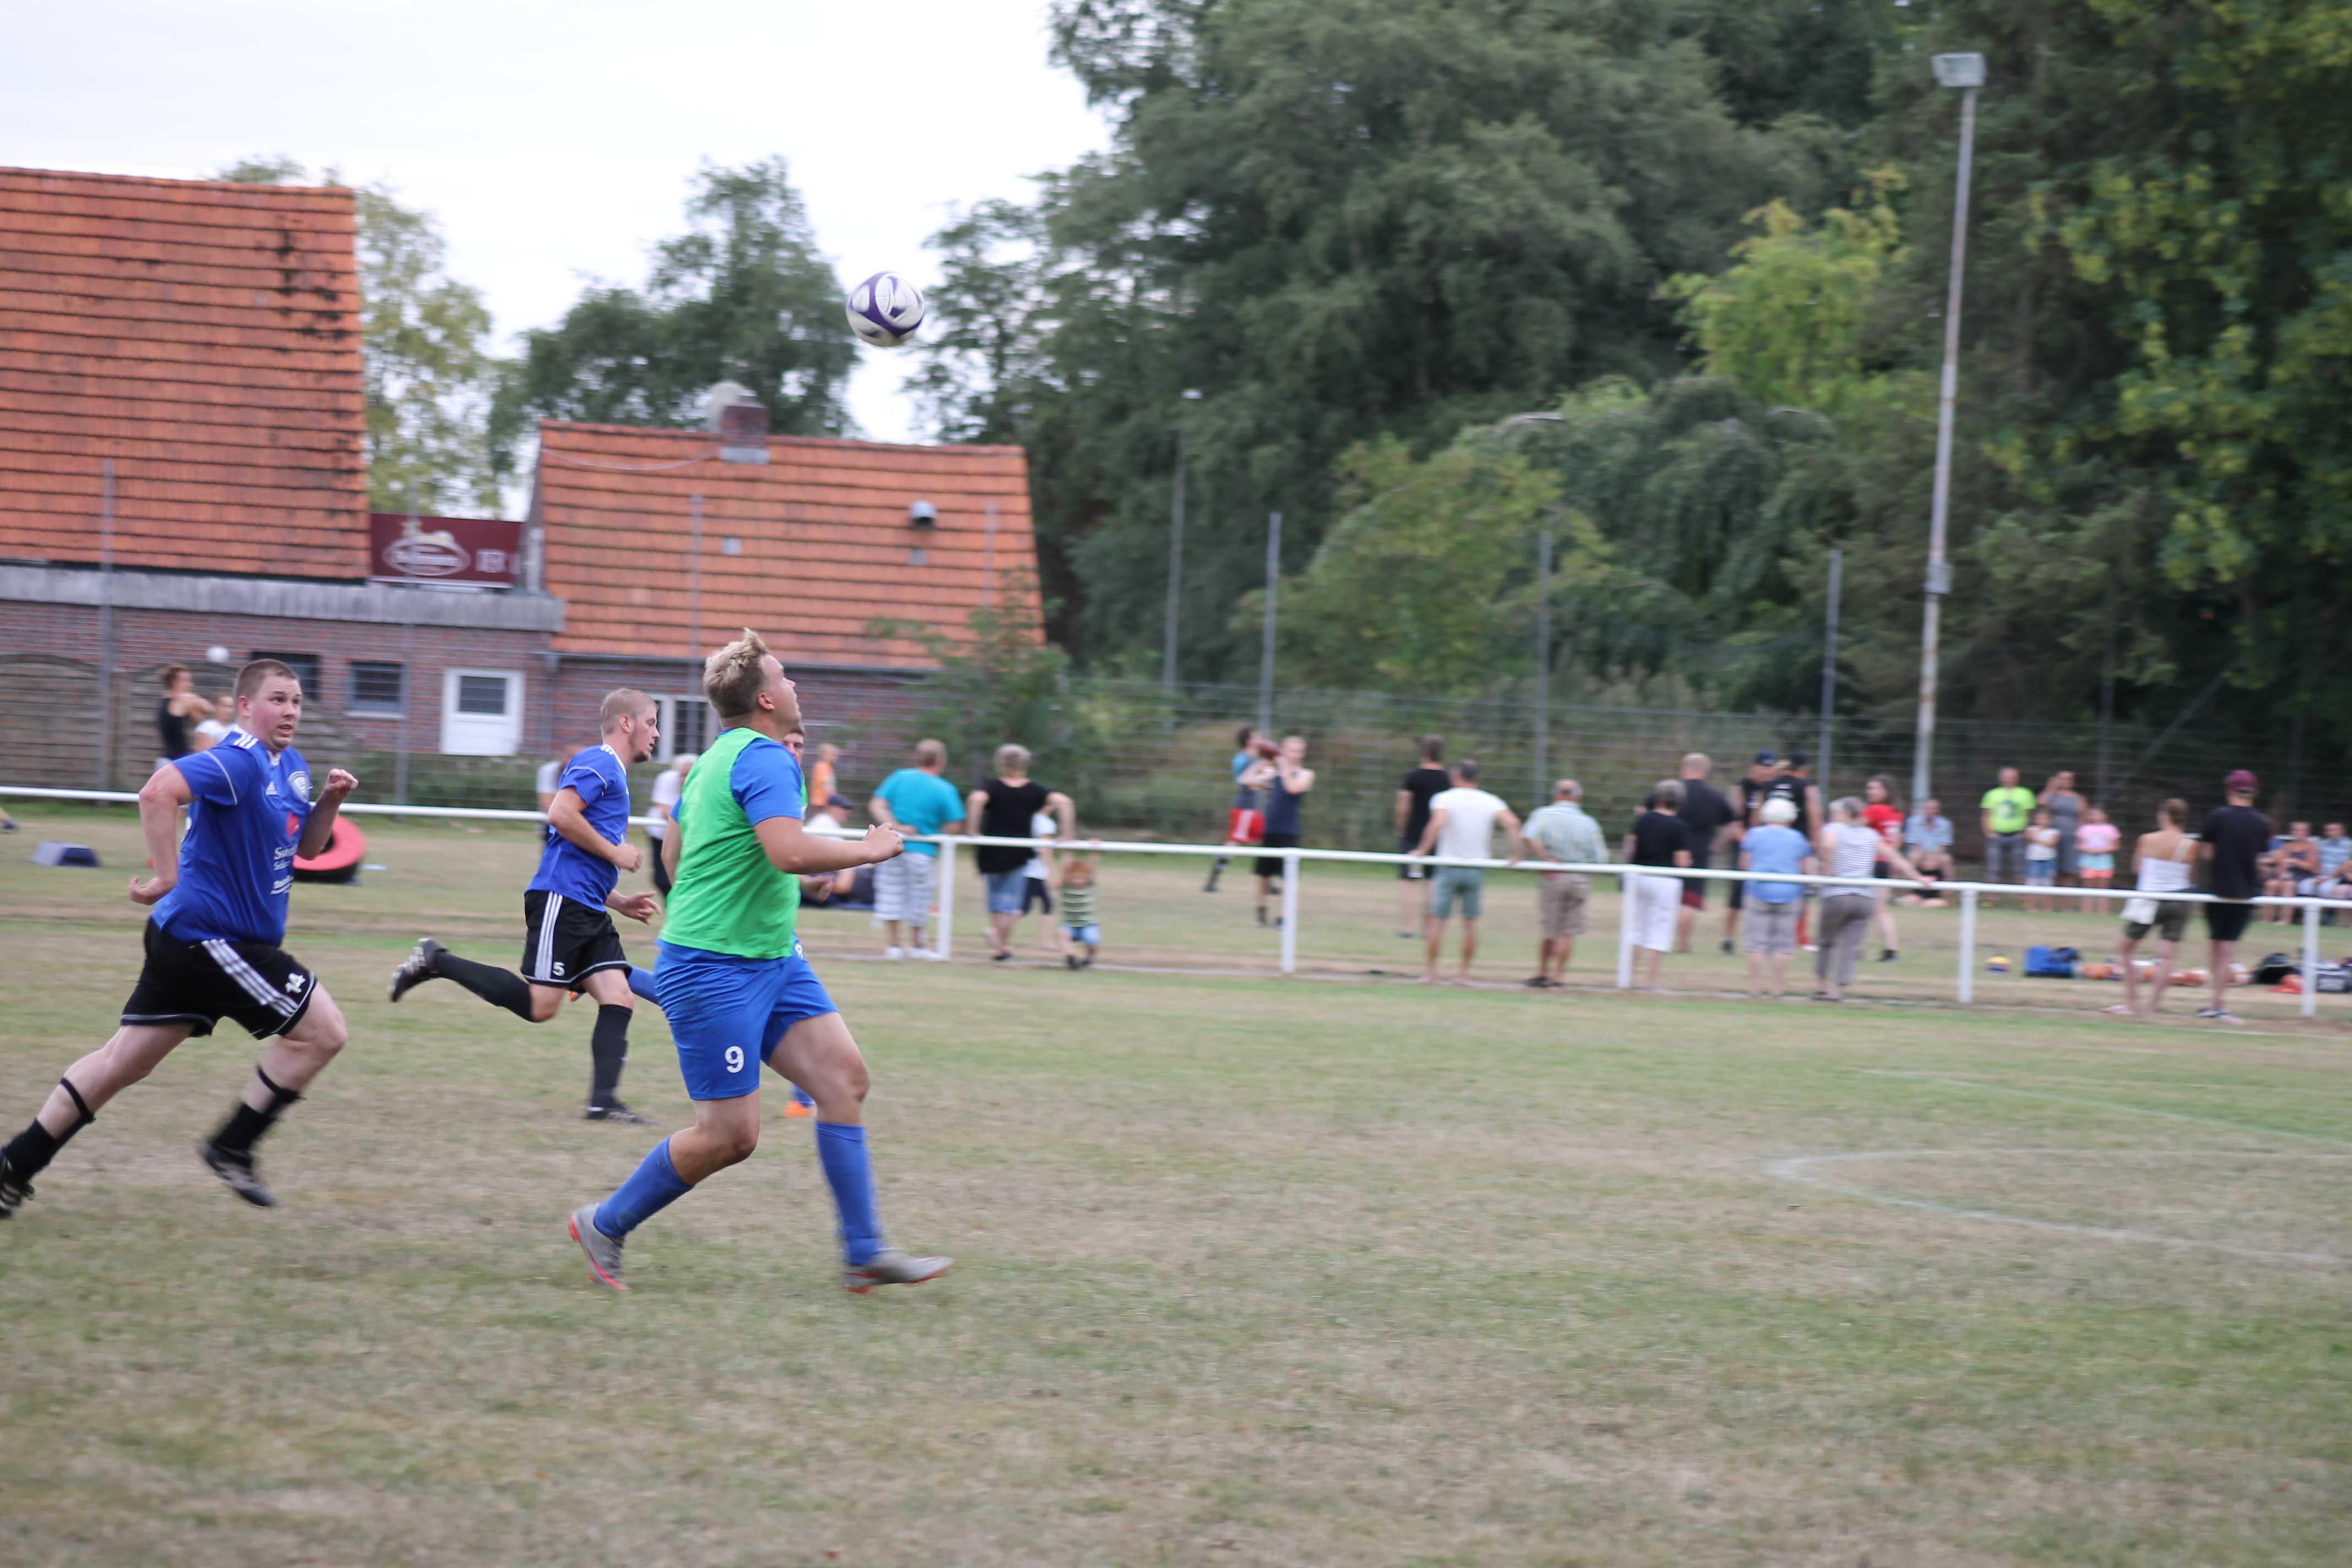 2018-07-29 Sportwoche - Sportpicknick & Football & Fußball (104)